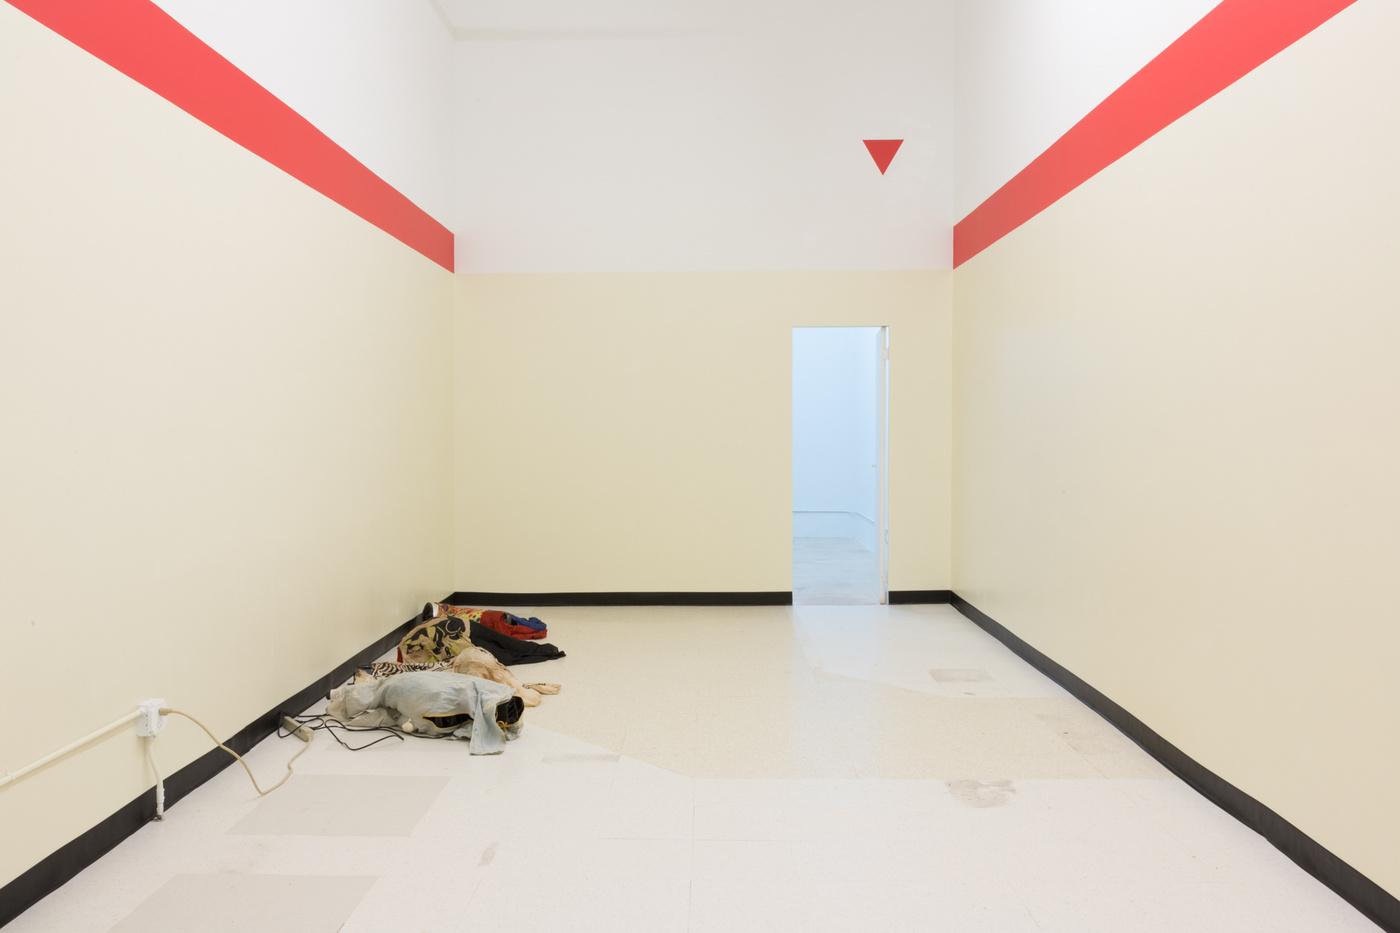 Tony Hope_LILAC, 2016_installation view_PRS 1